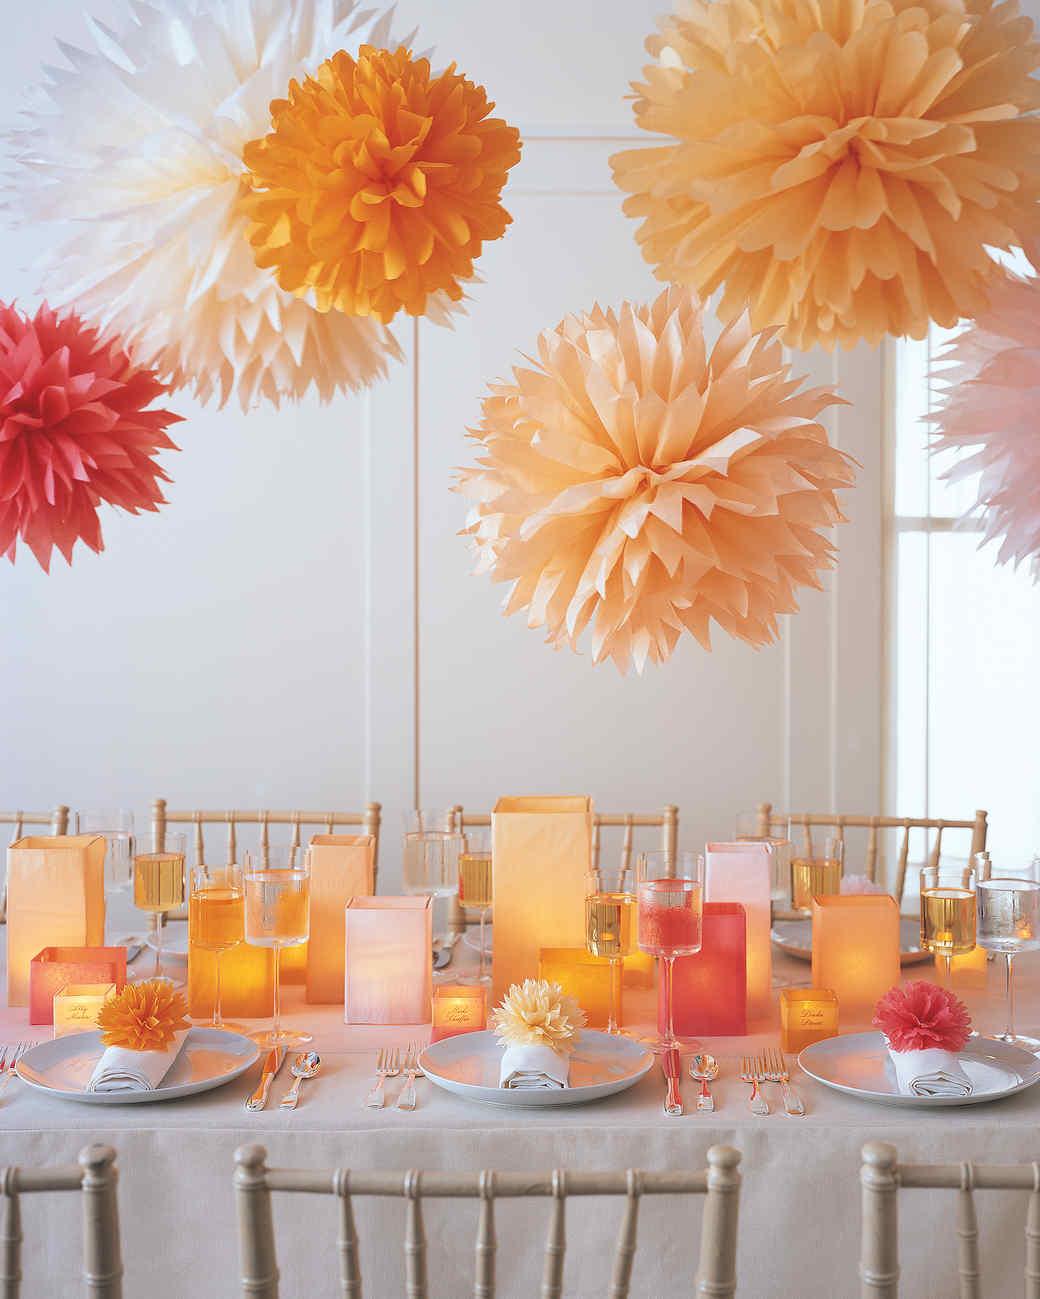 decoration halloween fait maison 2 Pom-Poms and Luminarias